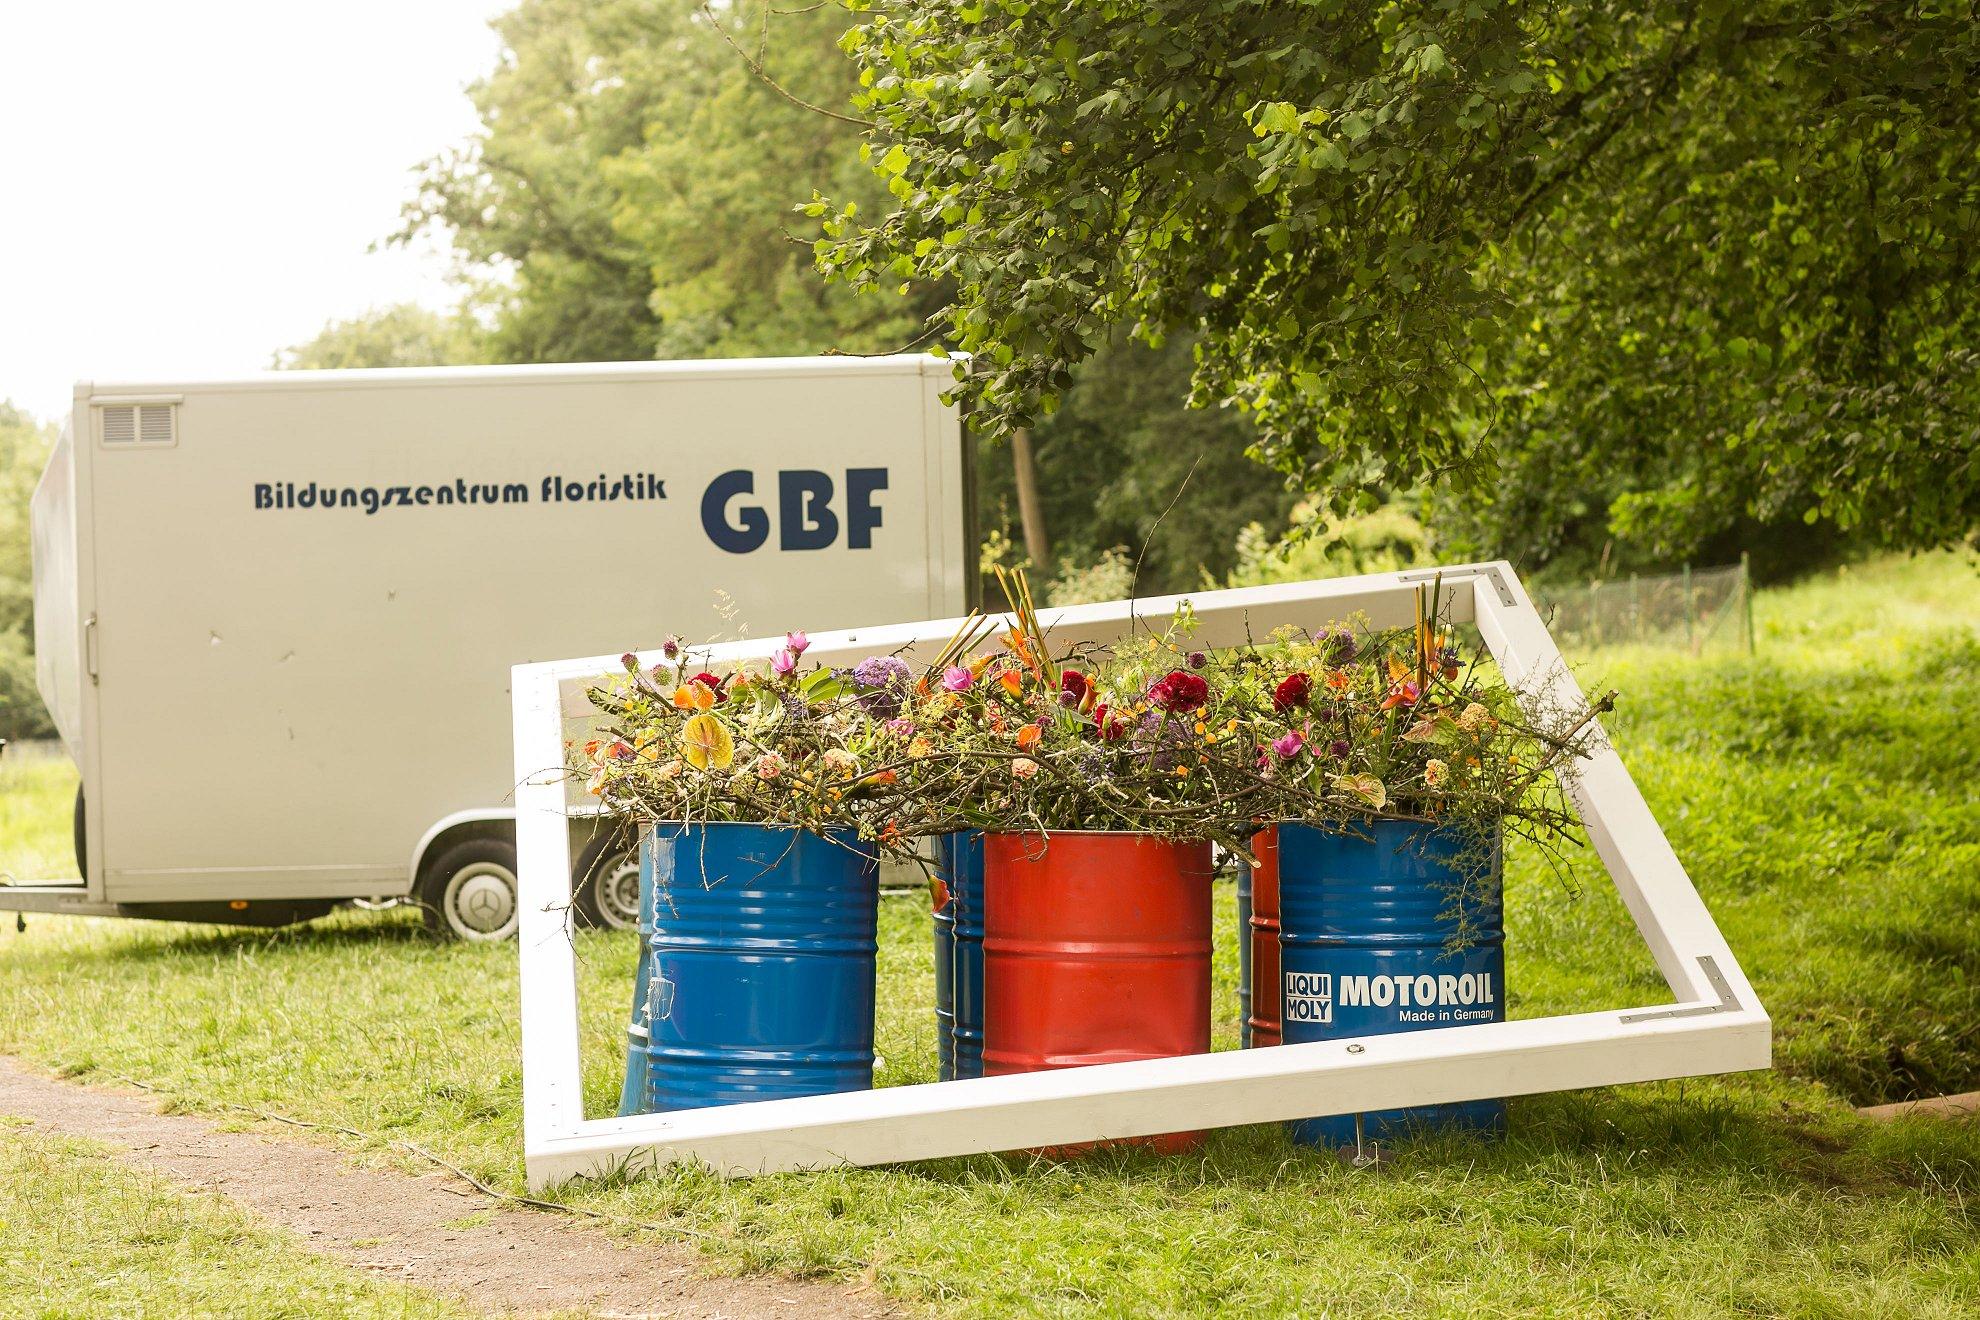 Grünberger Bildungszentrum für Floristik